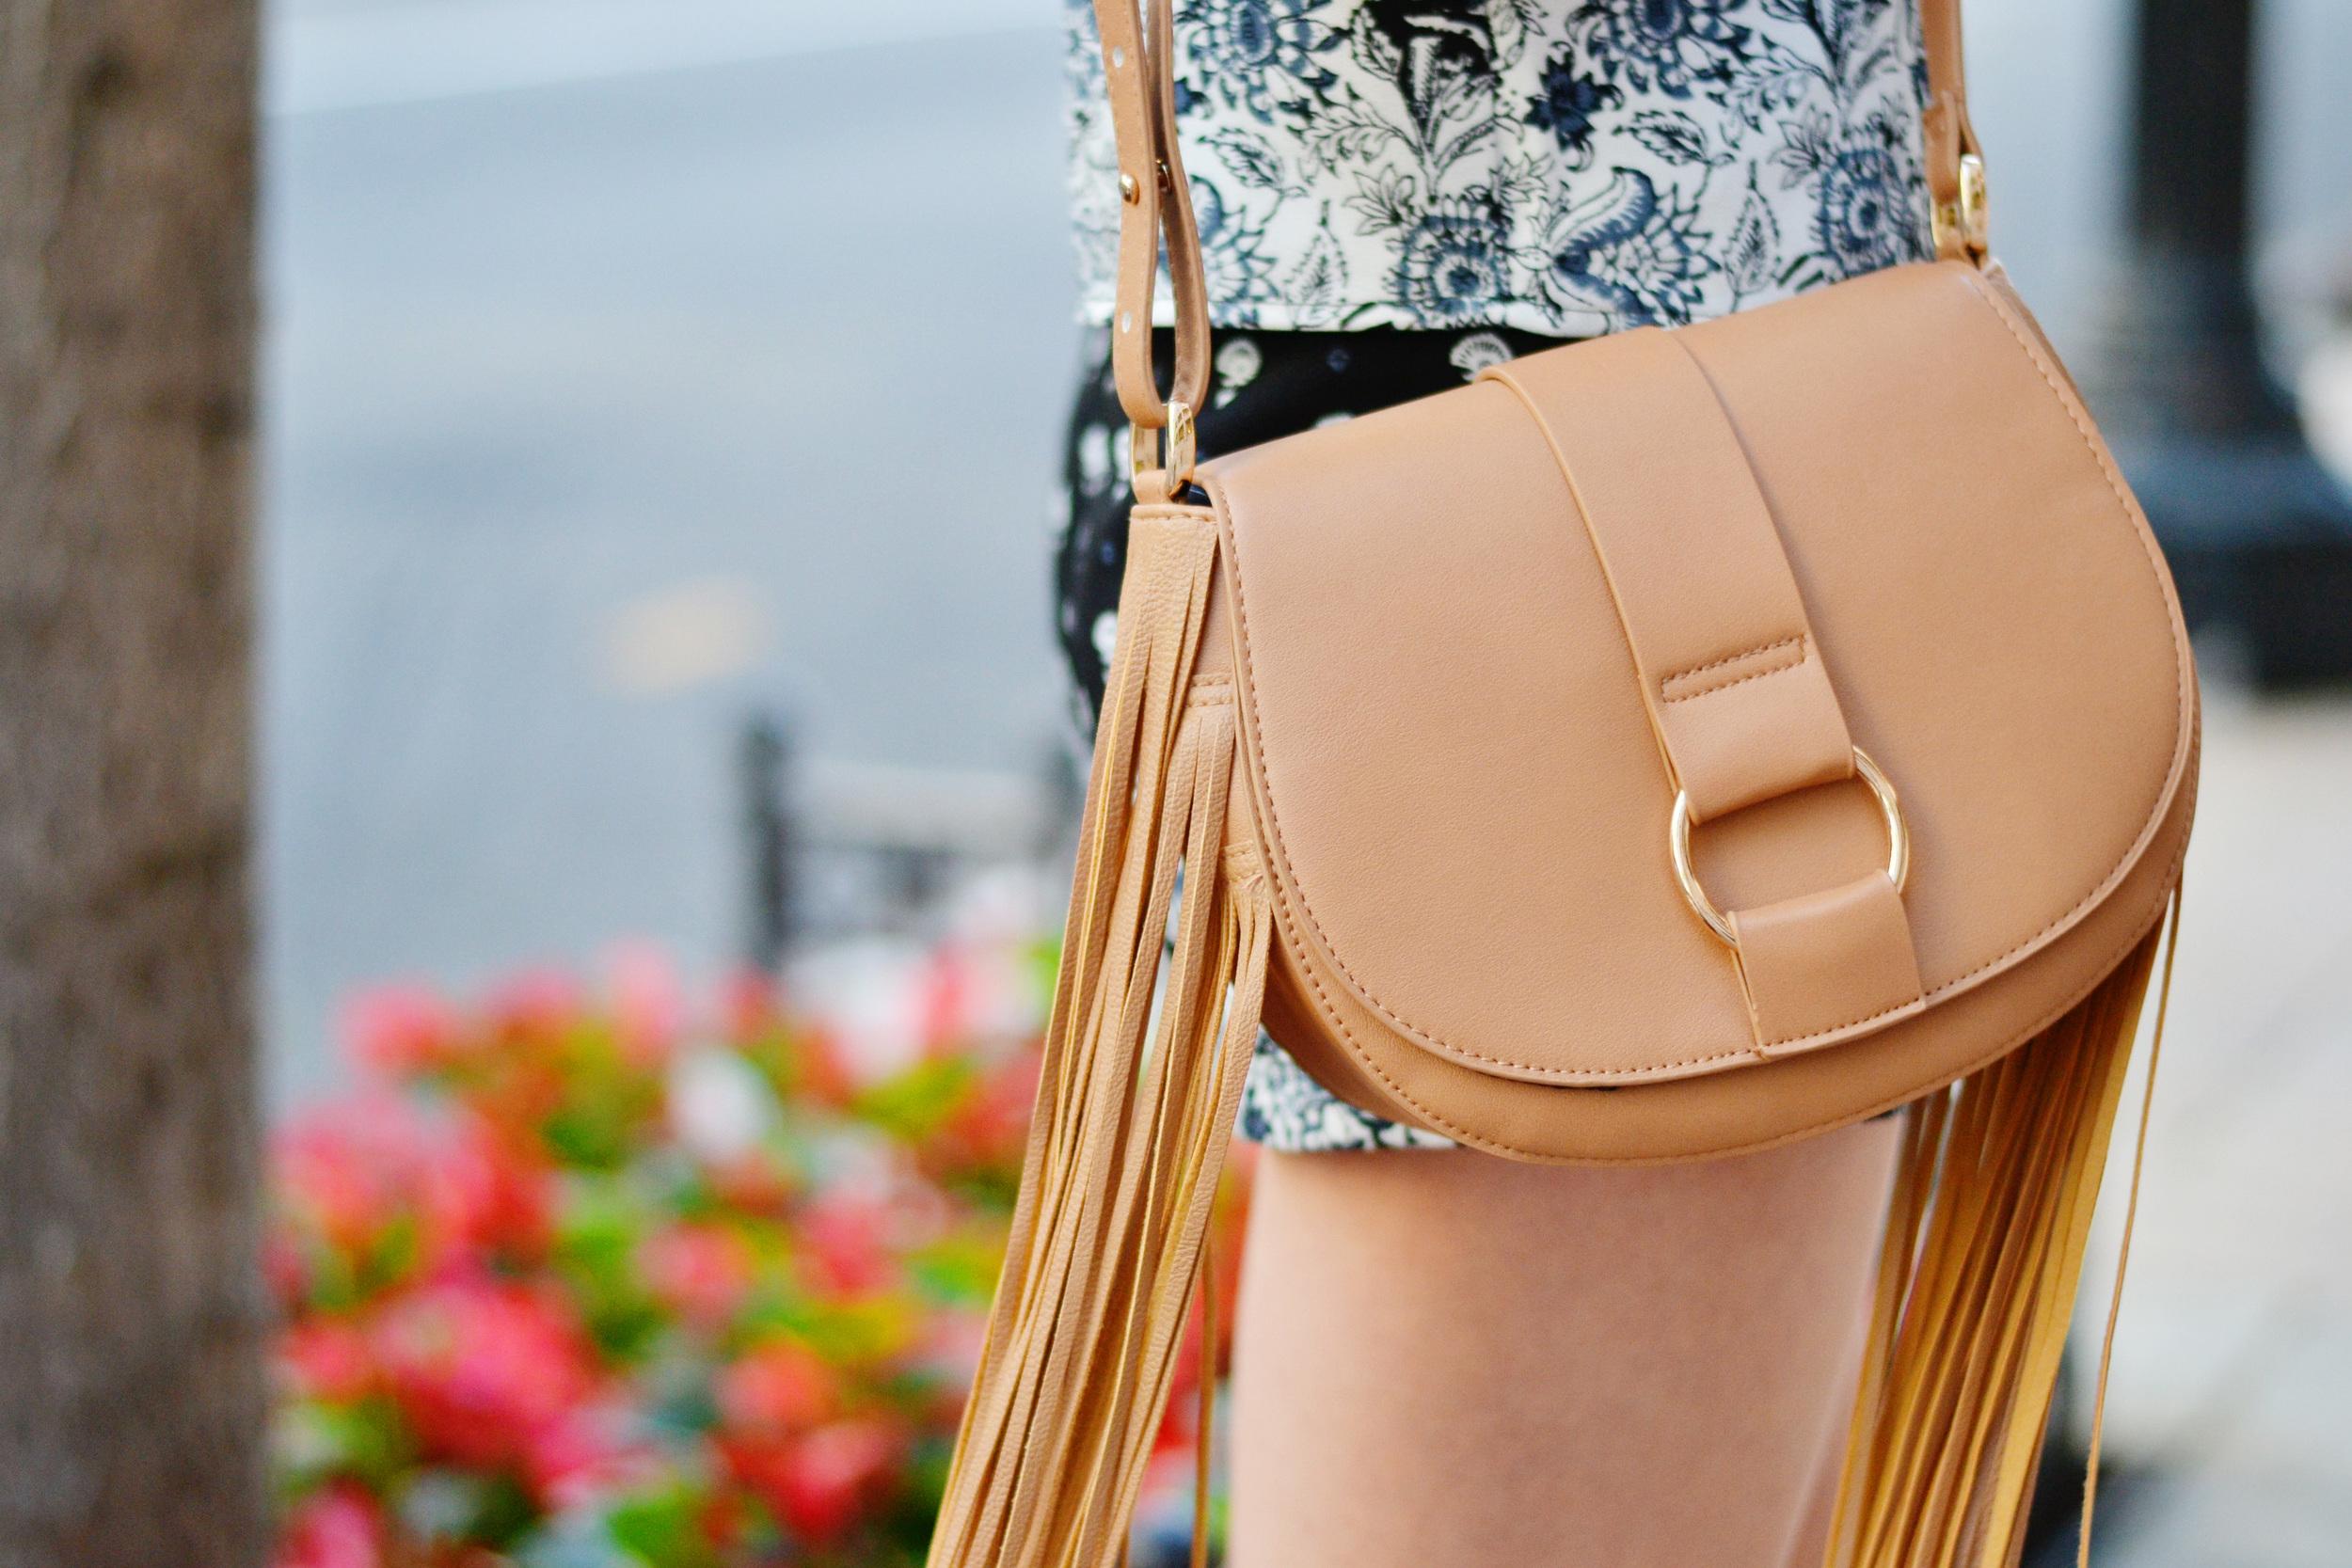 H&M Fringe Crossbody Bag (via Chic Now)